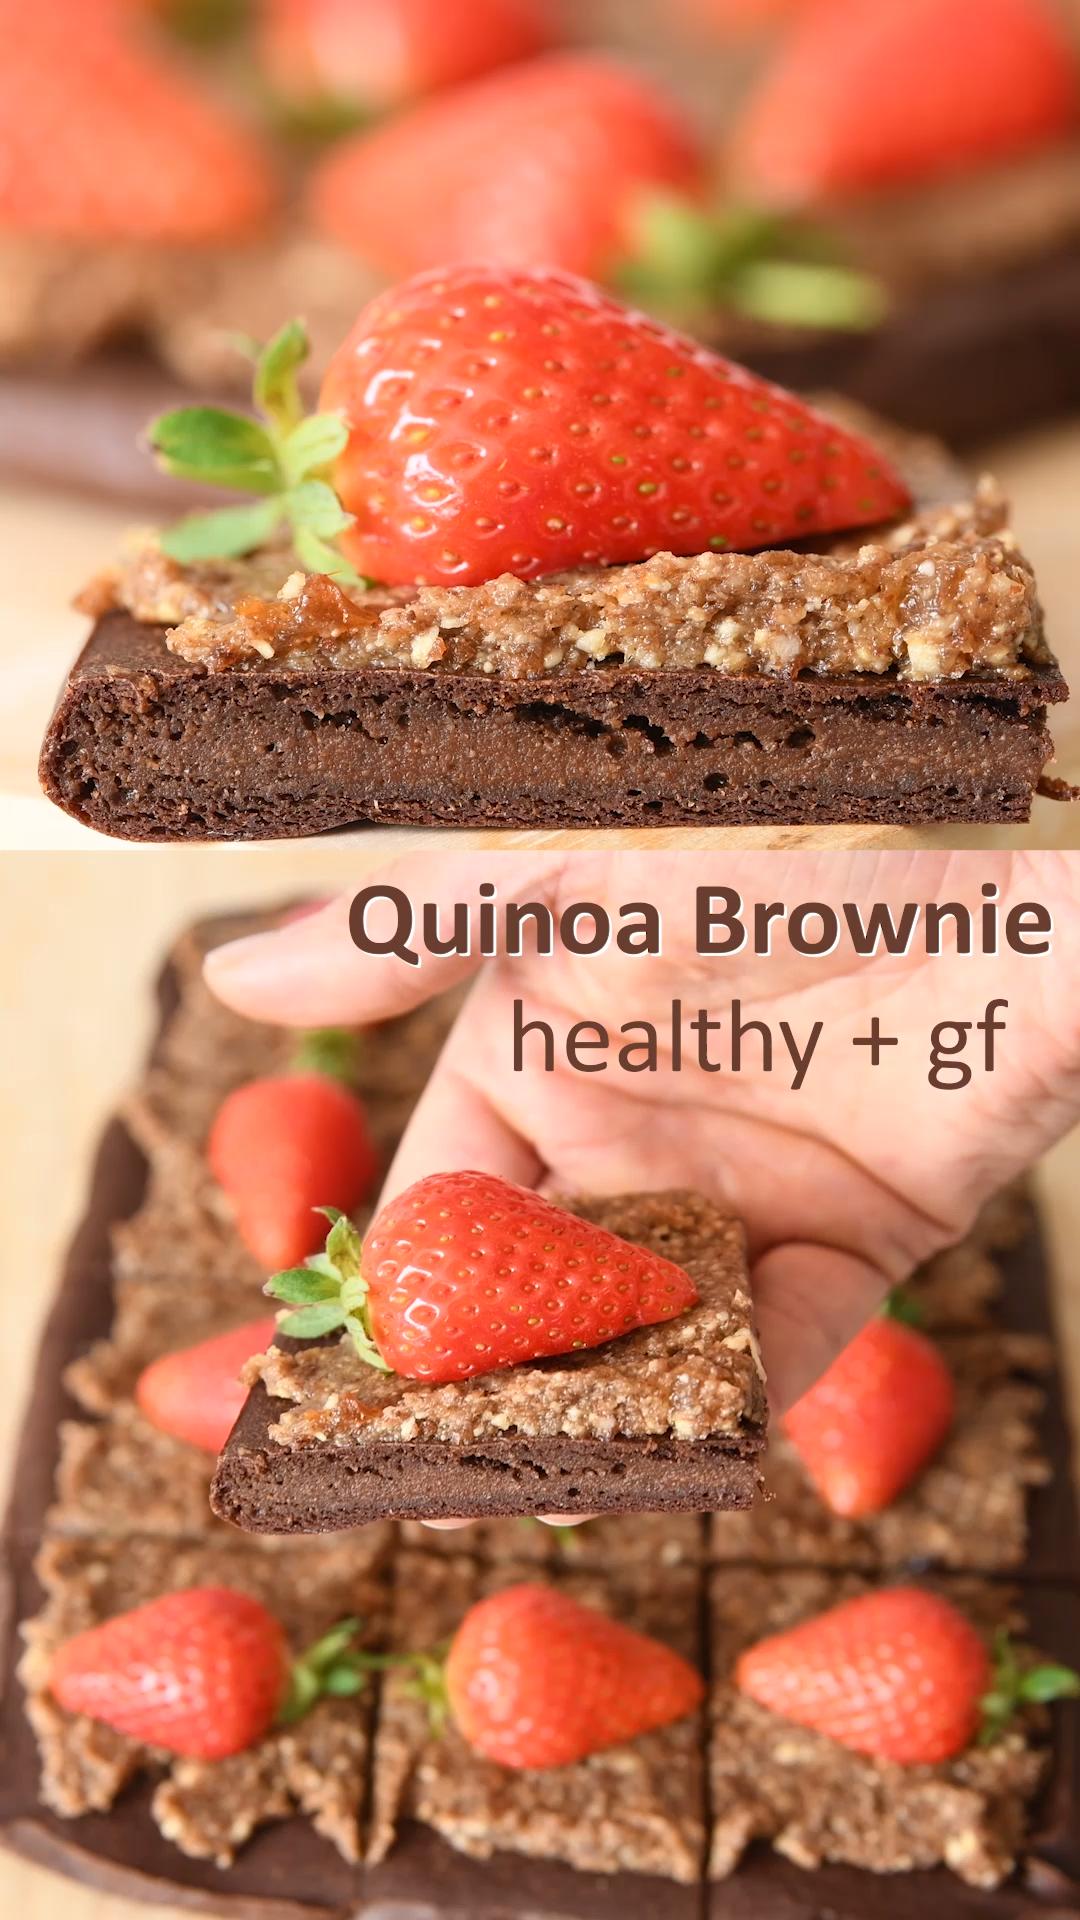 Quinoa Chocolate Brownie - 4 Ingredients #easythingstocook